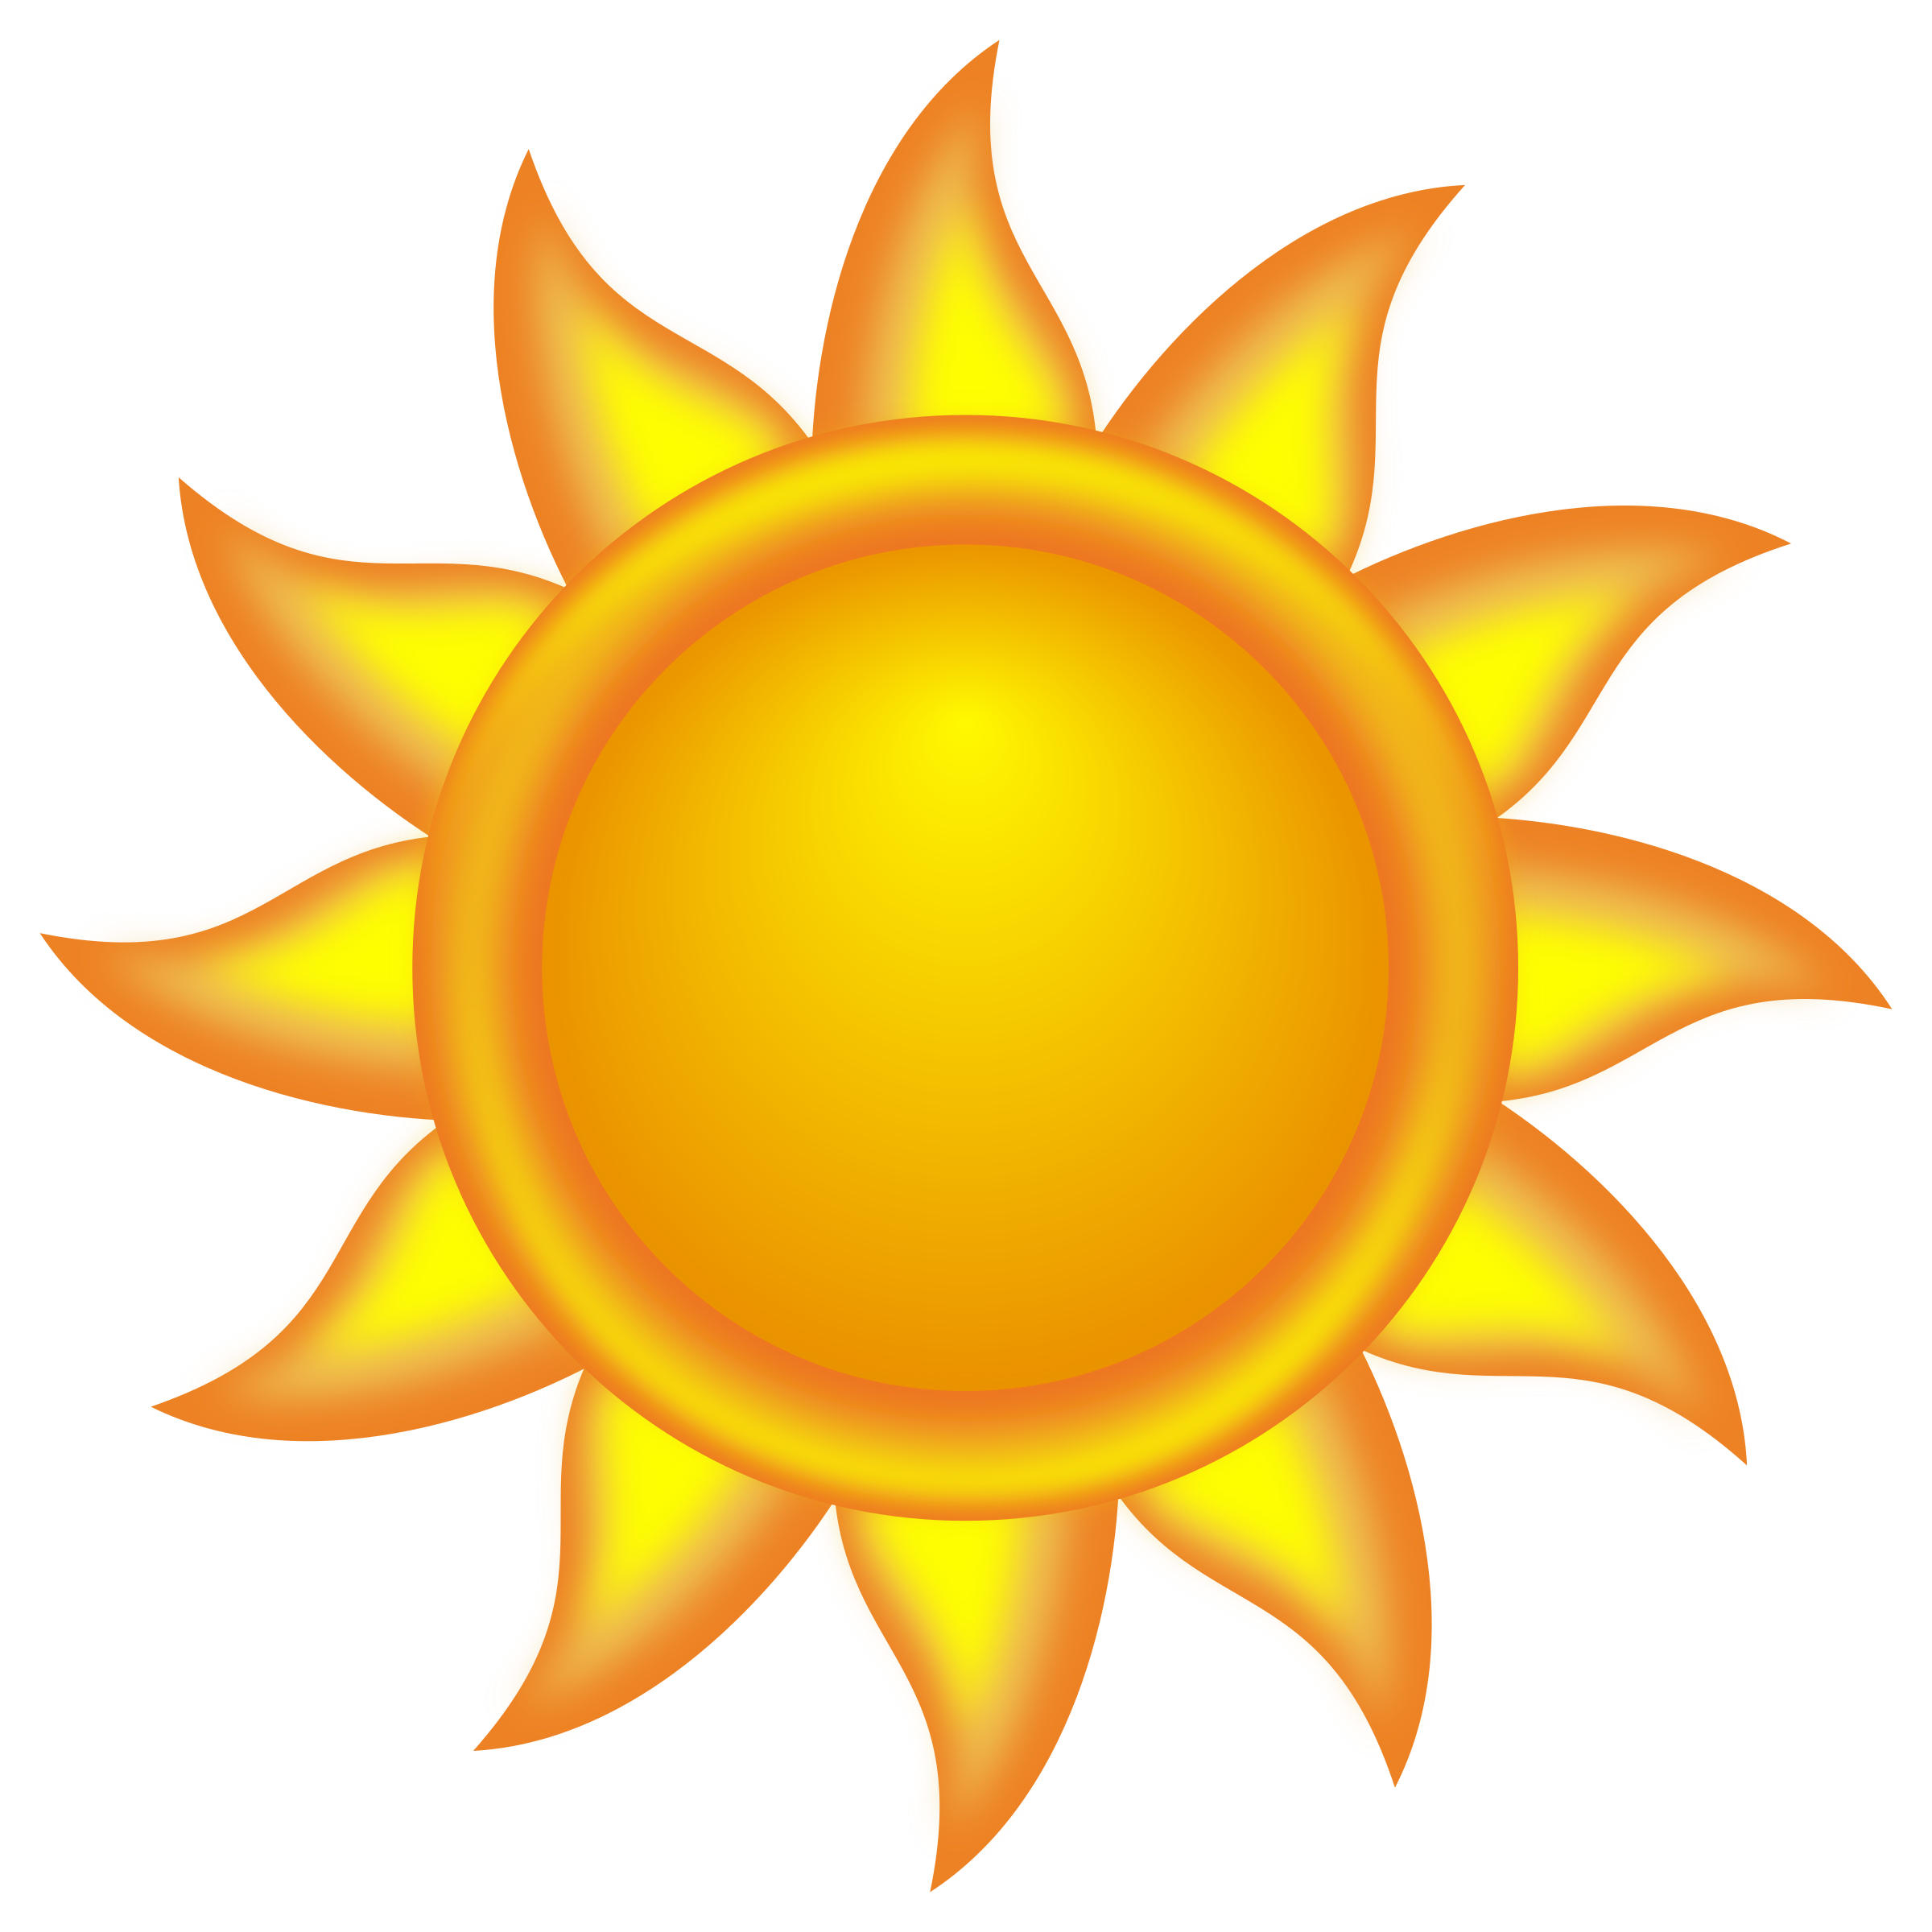 Blog summer sun. Heat clipart uses heat